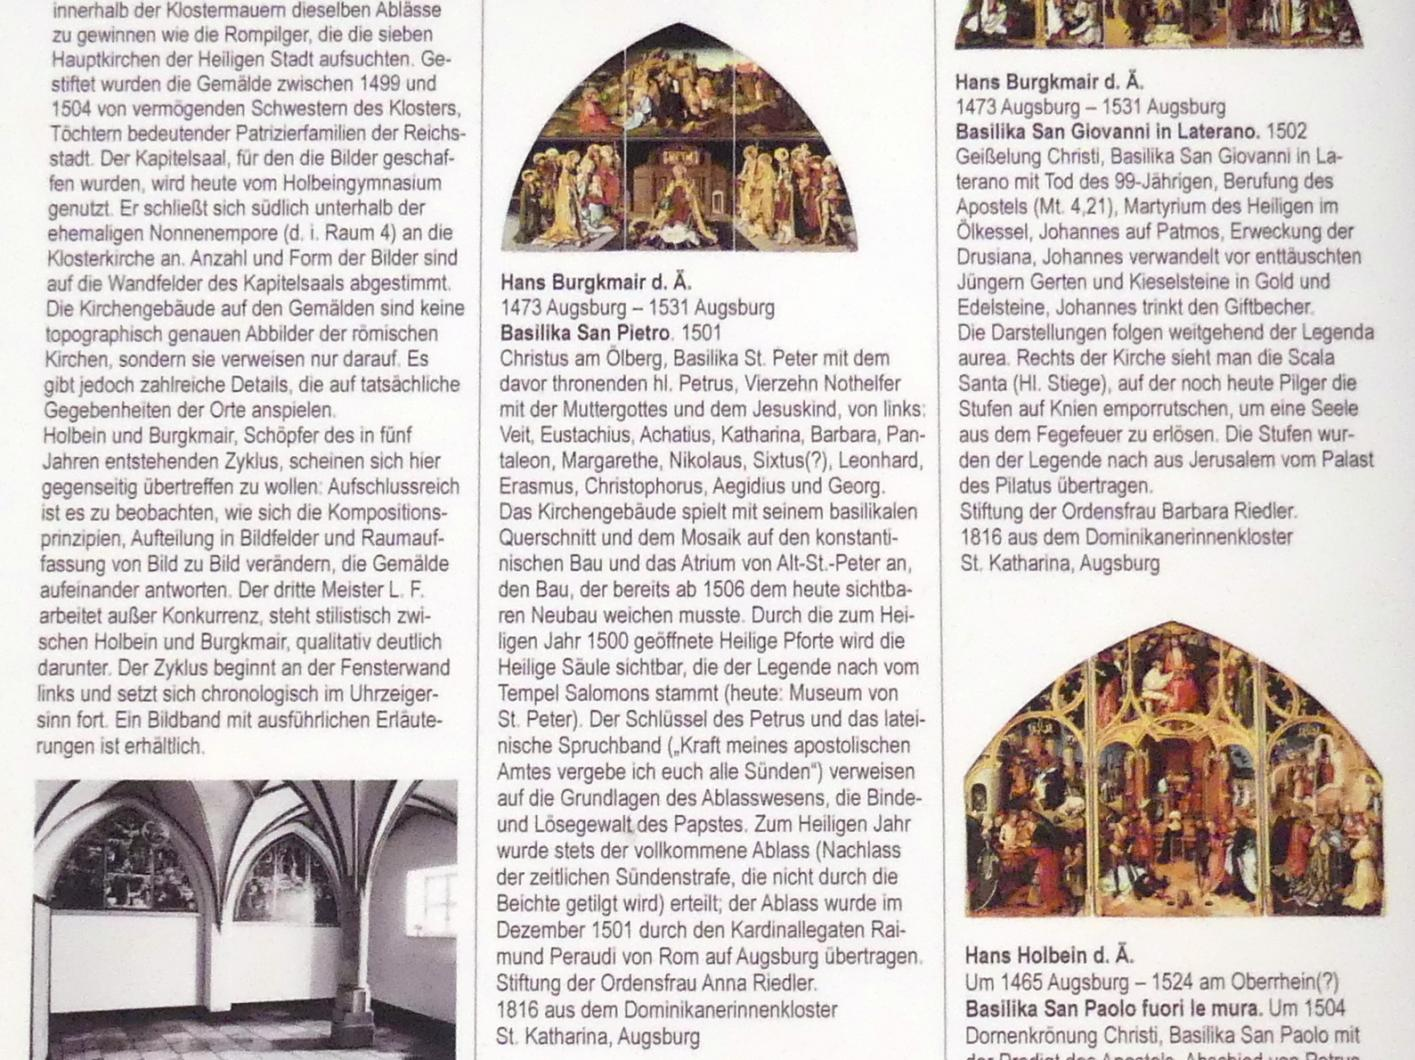 Hans Burgkmair der Ältere: Basilika San Pietro, 1501, Bild 3/3